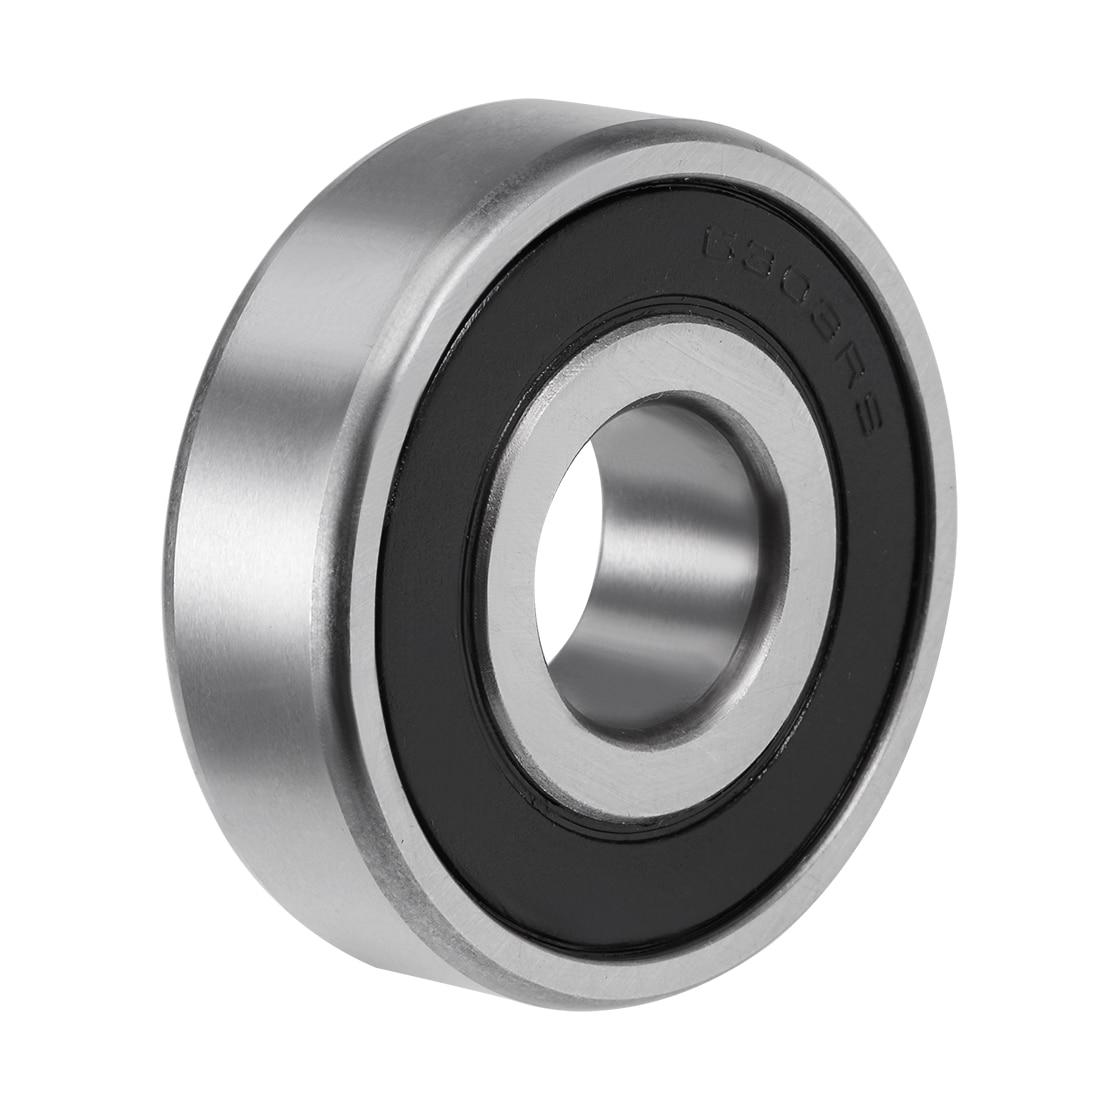 Uxcell ABEC-3 Bearings, 6200-6300 Ball Bearing 6303-2RS 1pcs